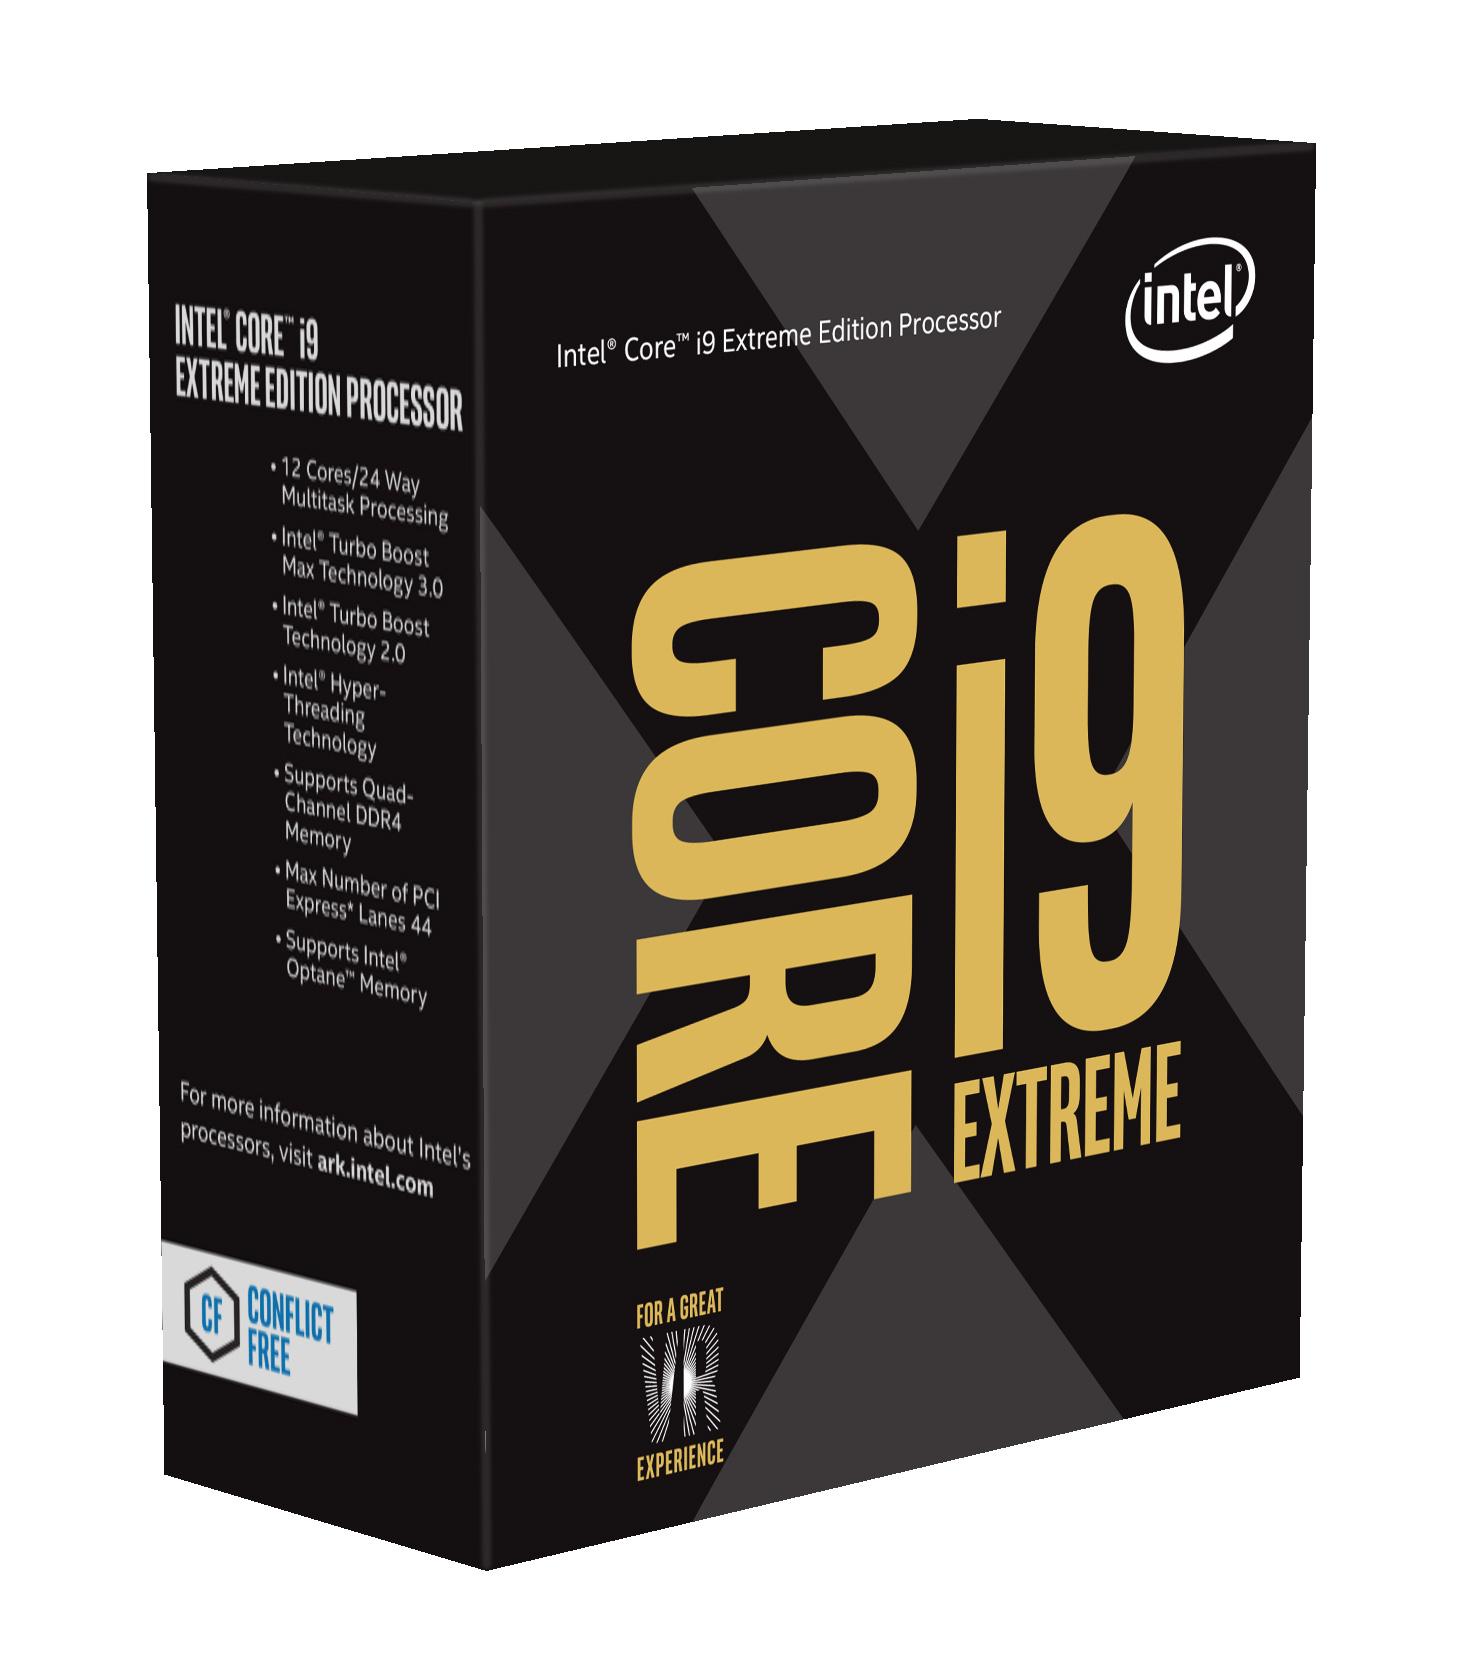 Intel Core i9 7900X Skylake-X 10-Core 3.3 GHz LGA 2066 13.75MB Cache Desktop Processor BX80673I97900X by Intel